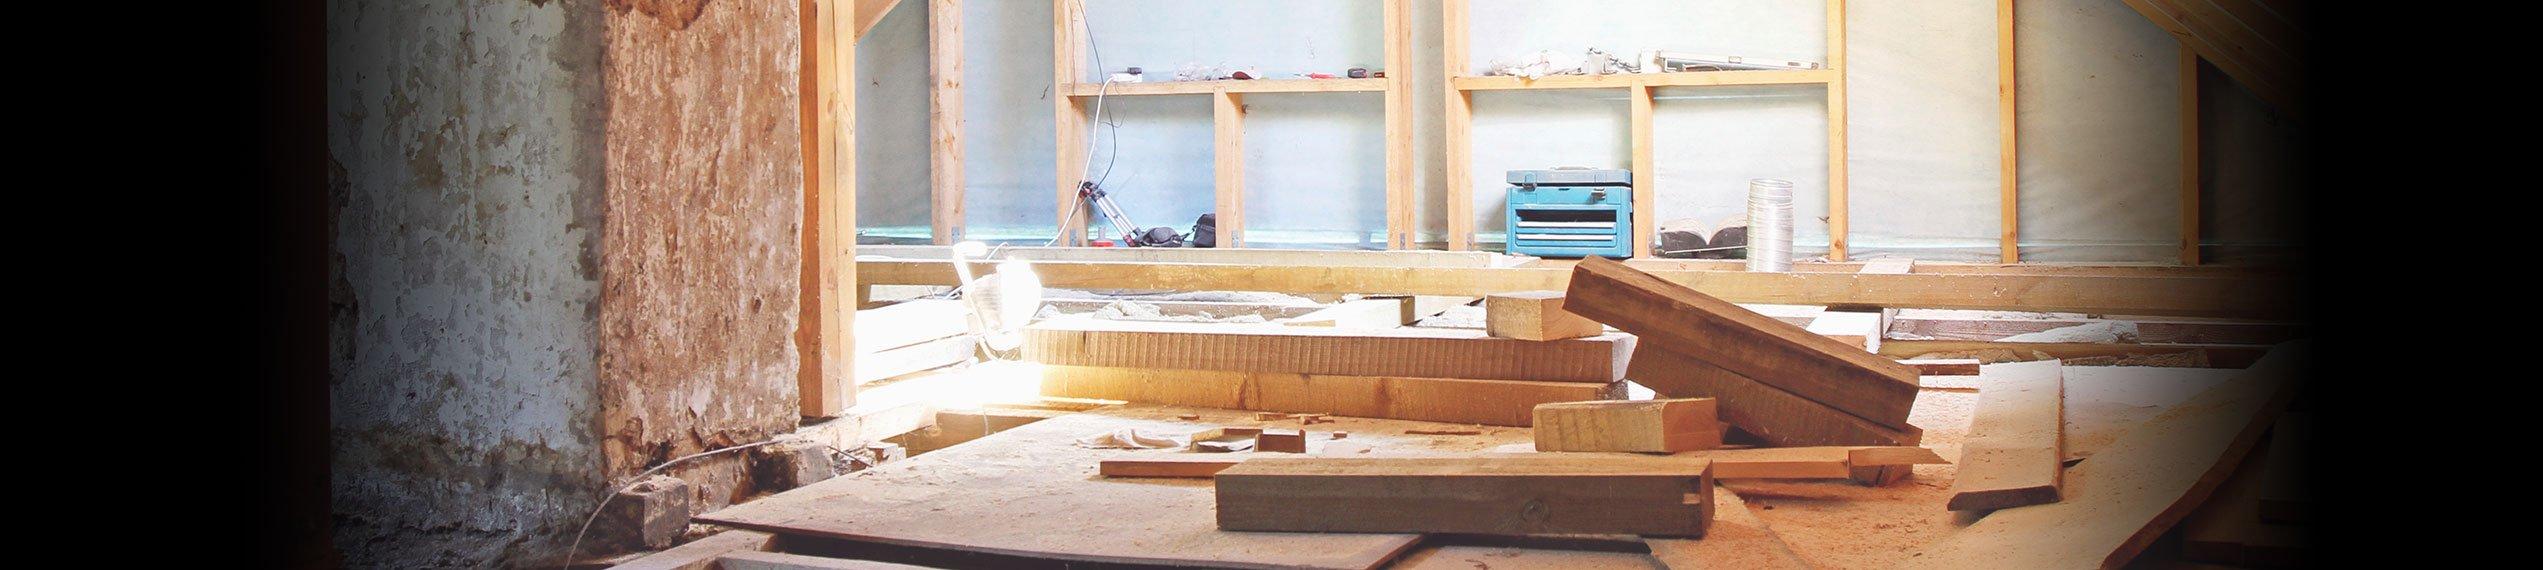 Remodeling Services in Paul Davis Restoration Of Augusta/Aiken